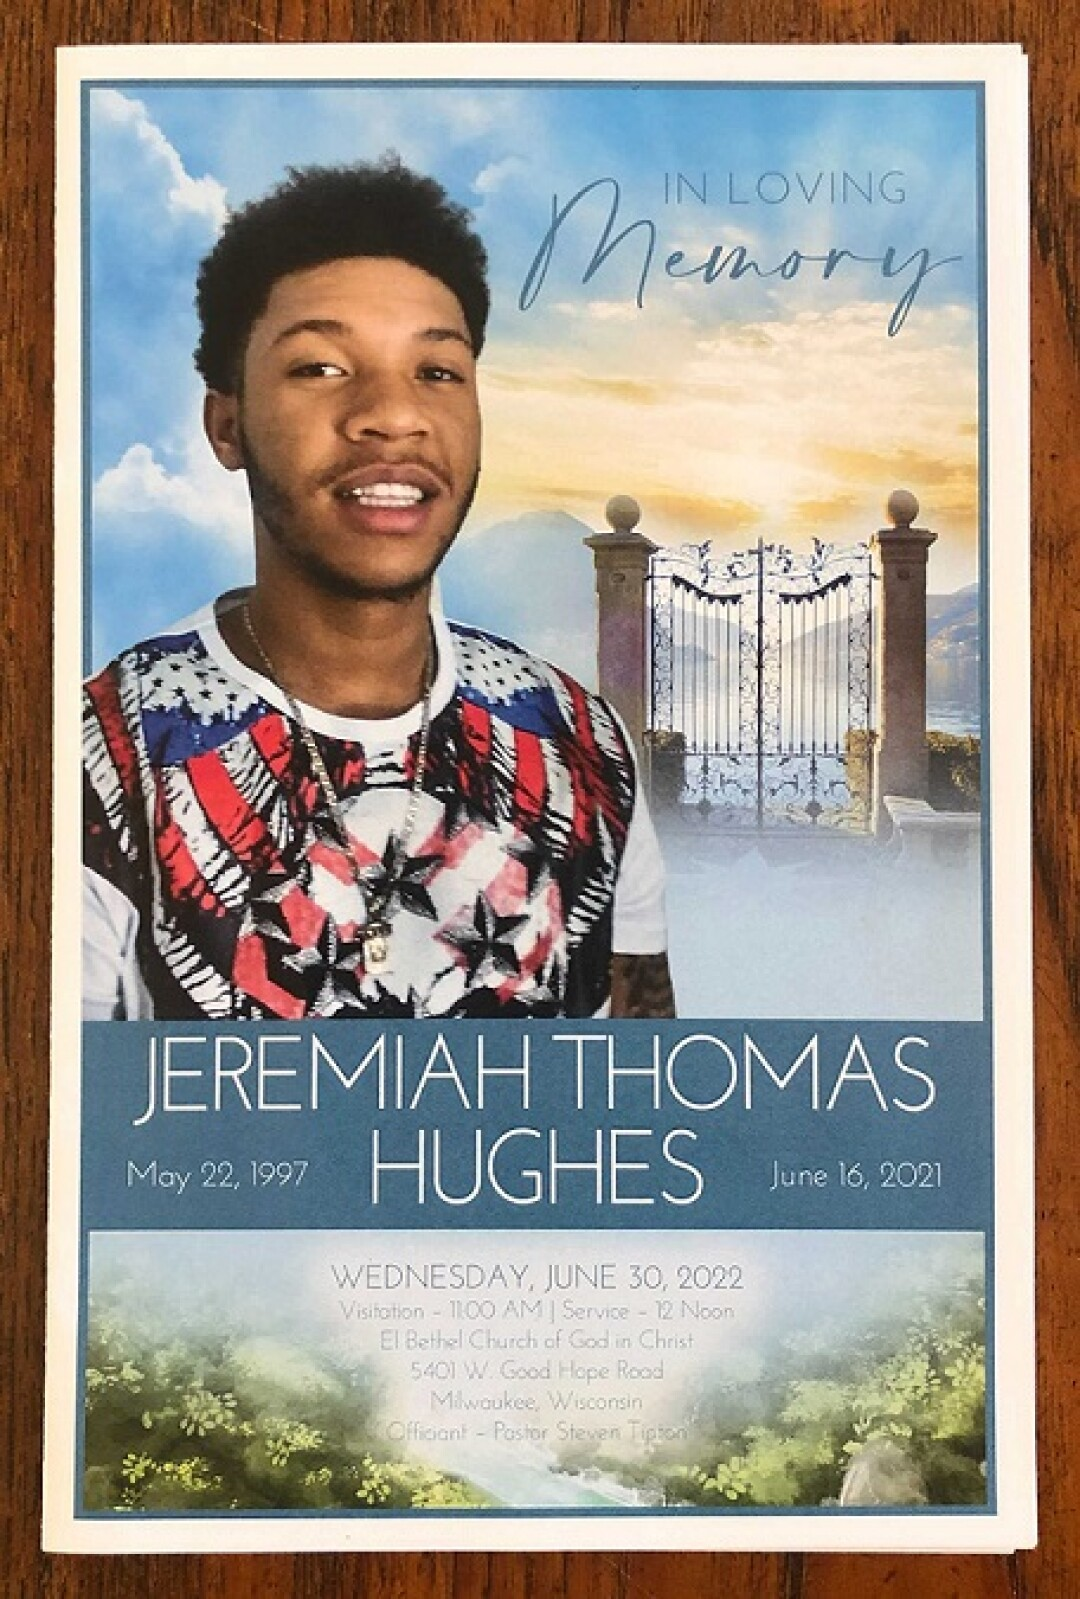 Jeremiah Hughes' obituary